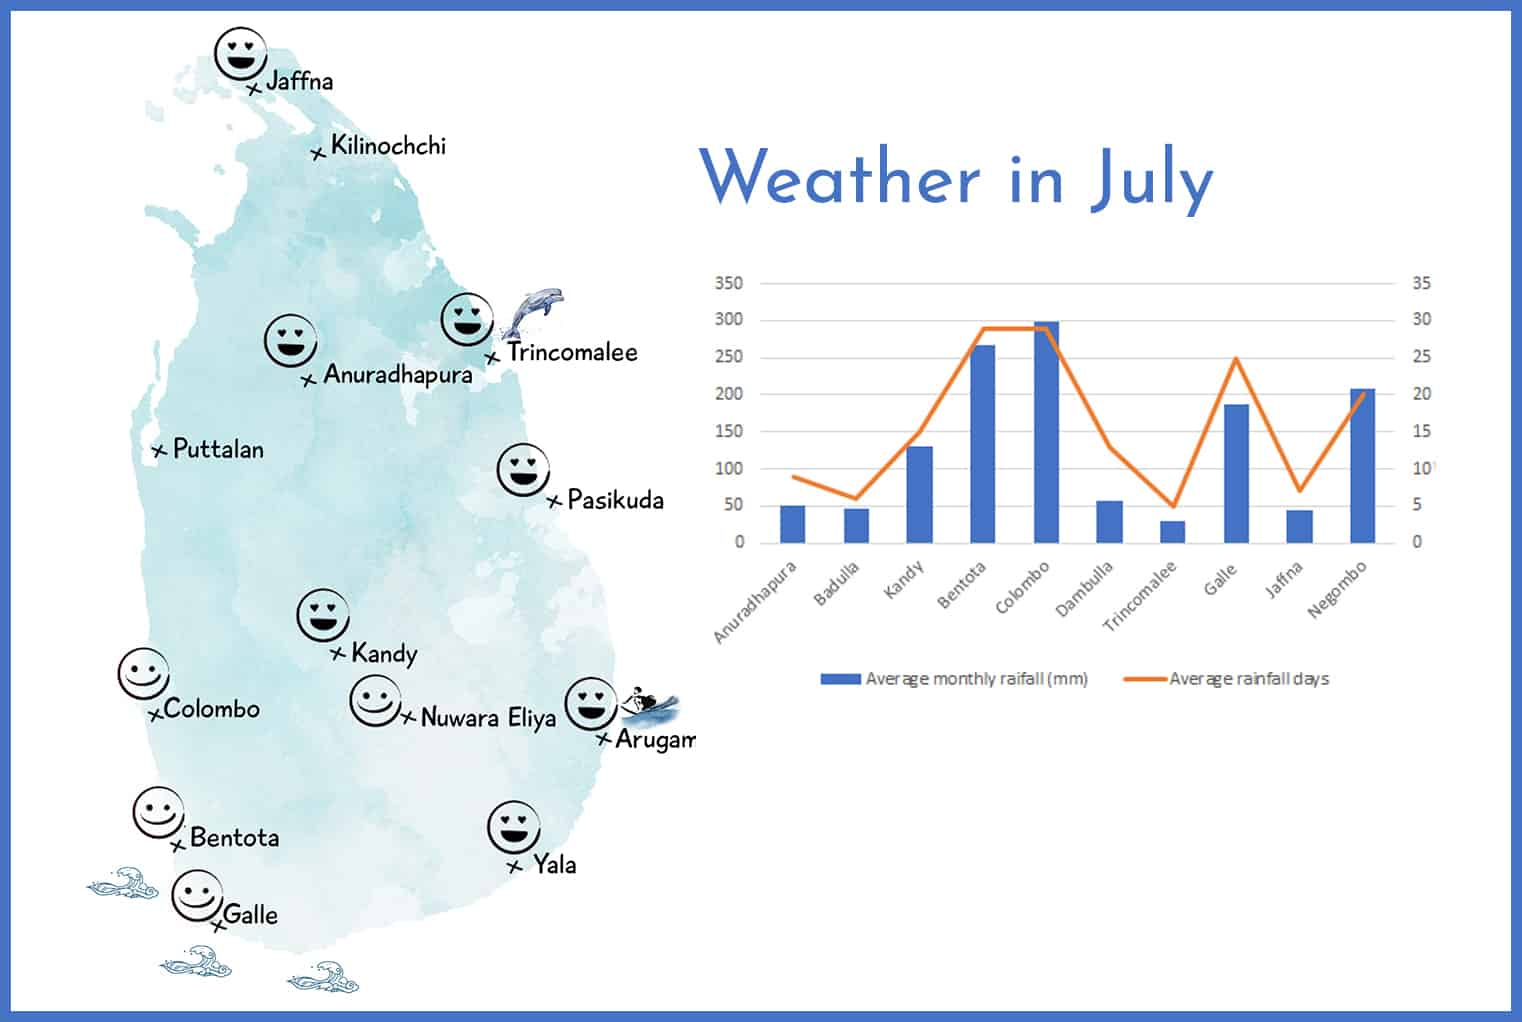 Weather in Sri Lanka in July